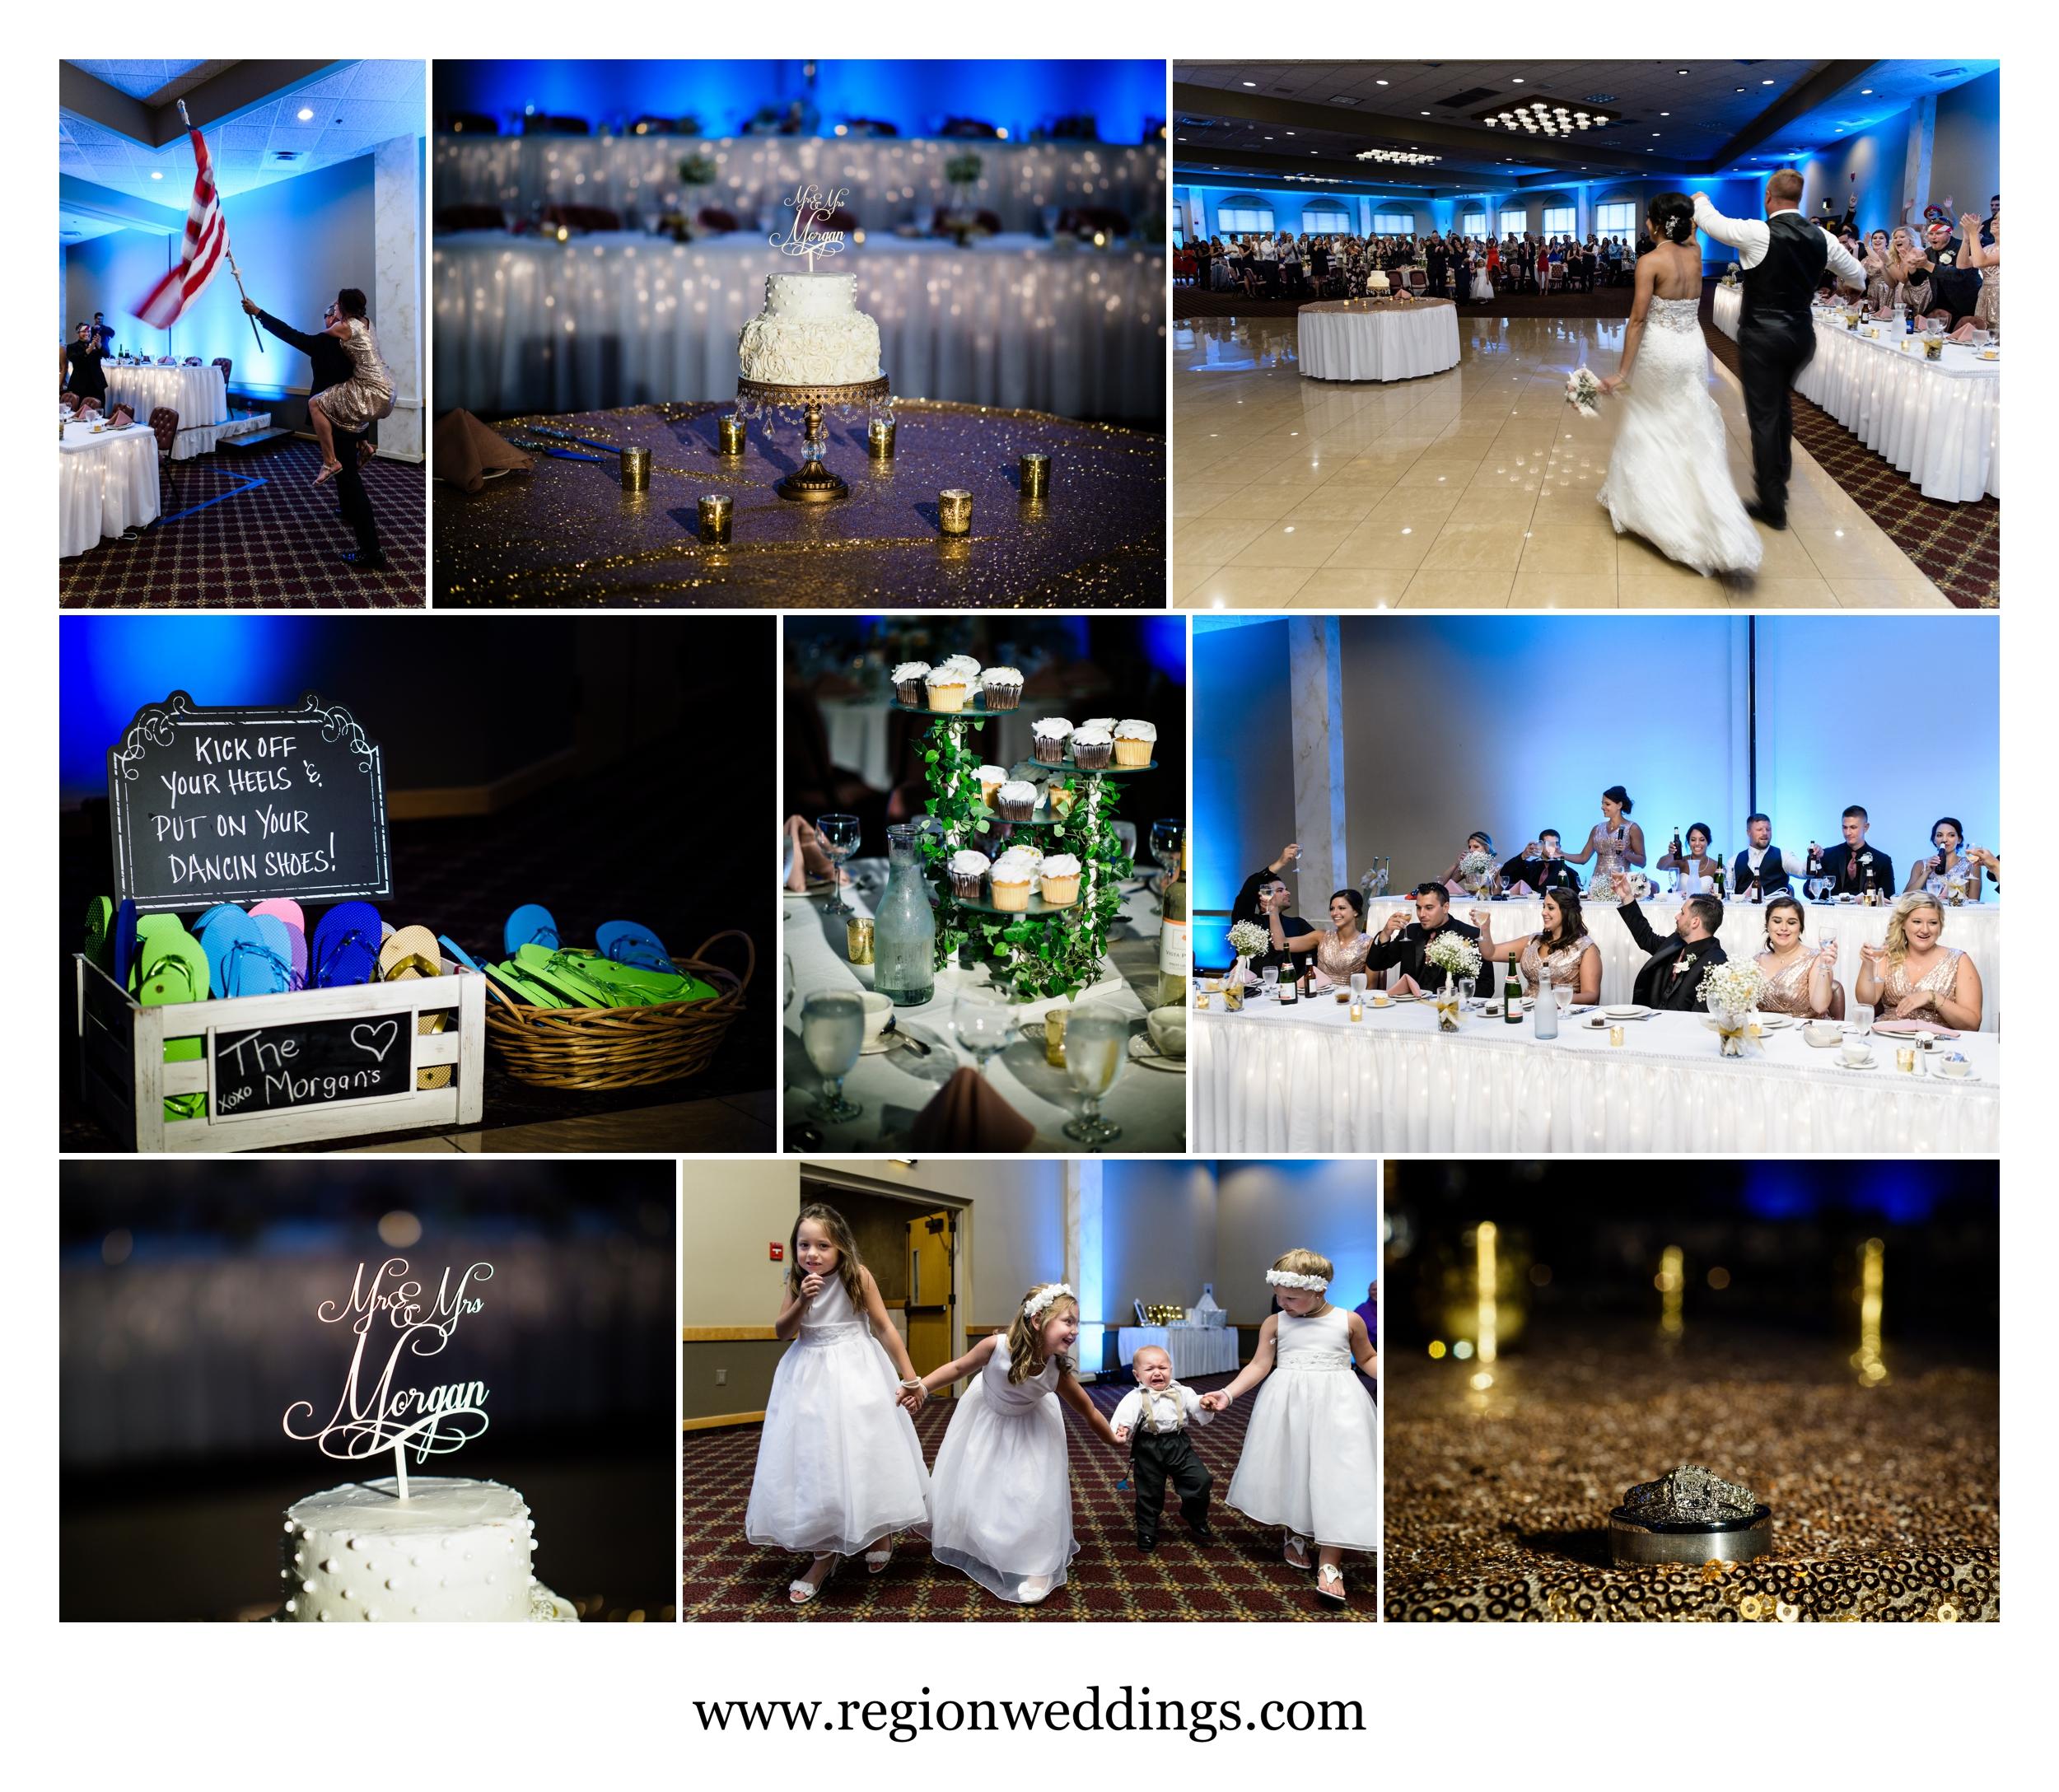 June wedding reception at Villa Cesare in Schererville, Indiana.